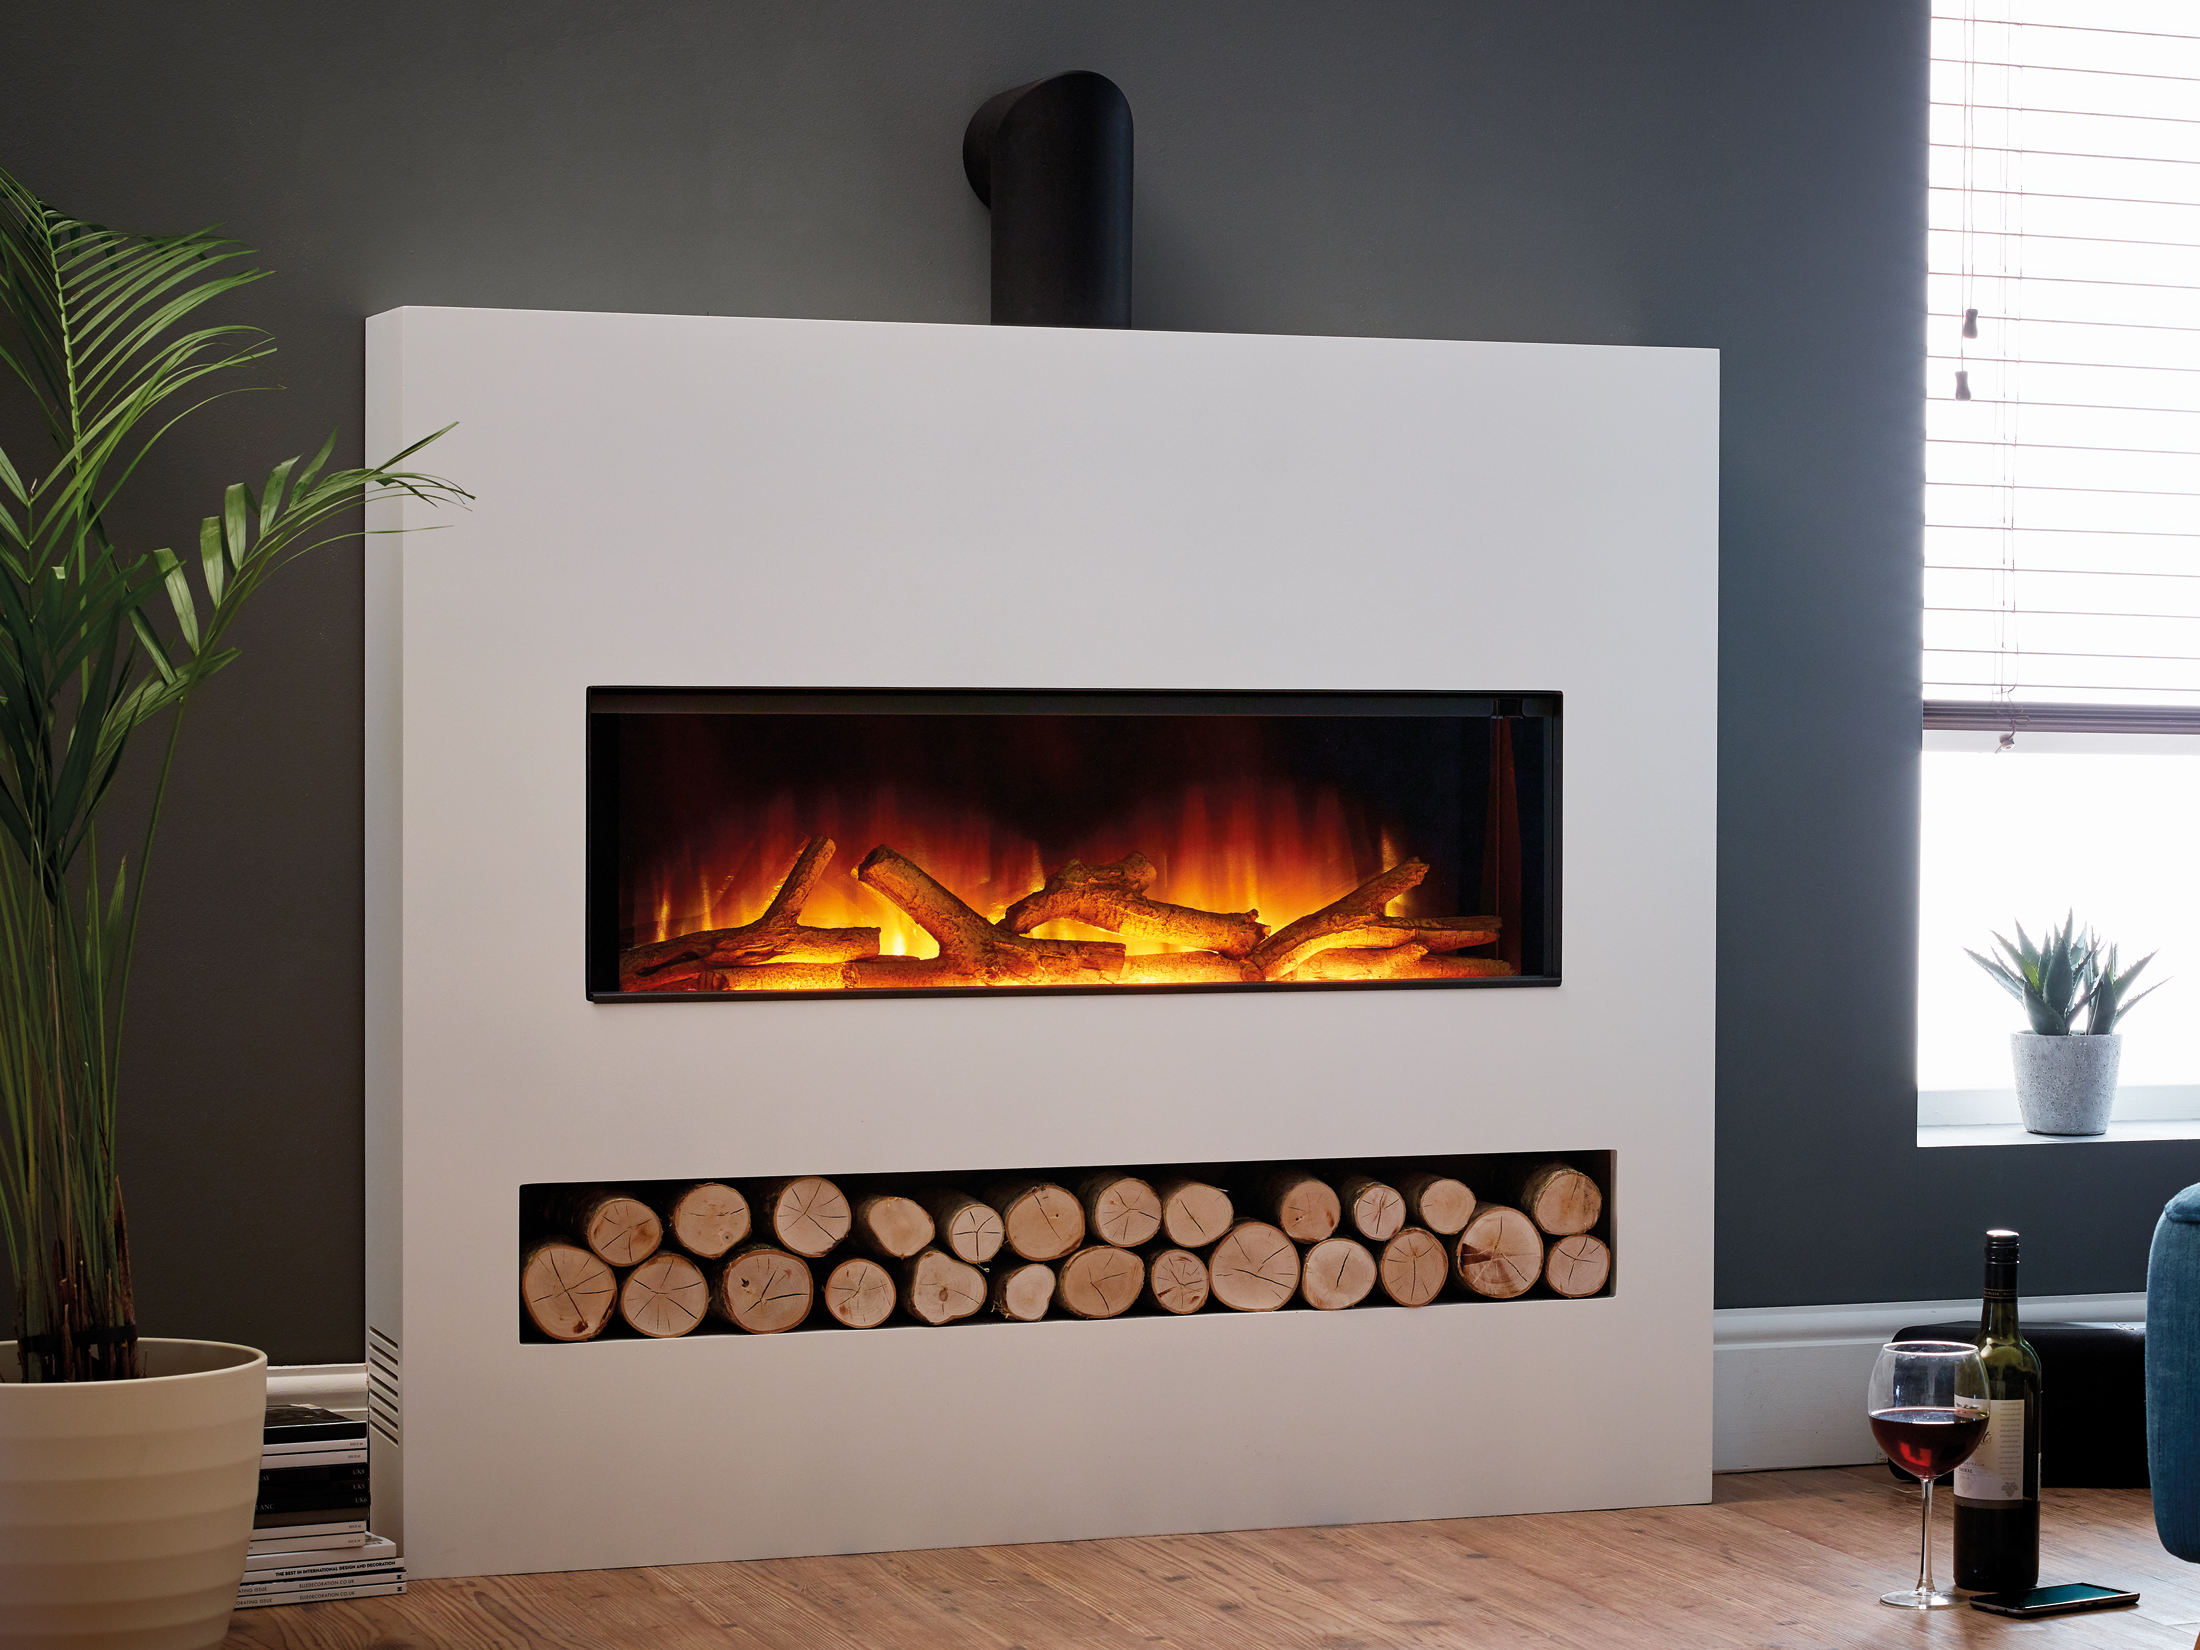 Gotham 900 fireplace suite